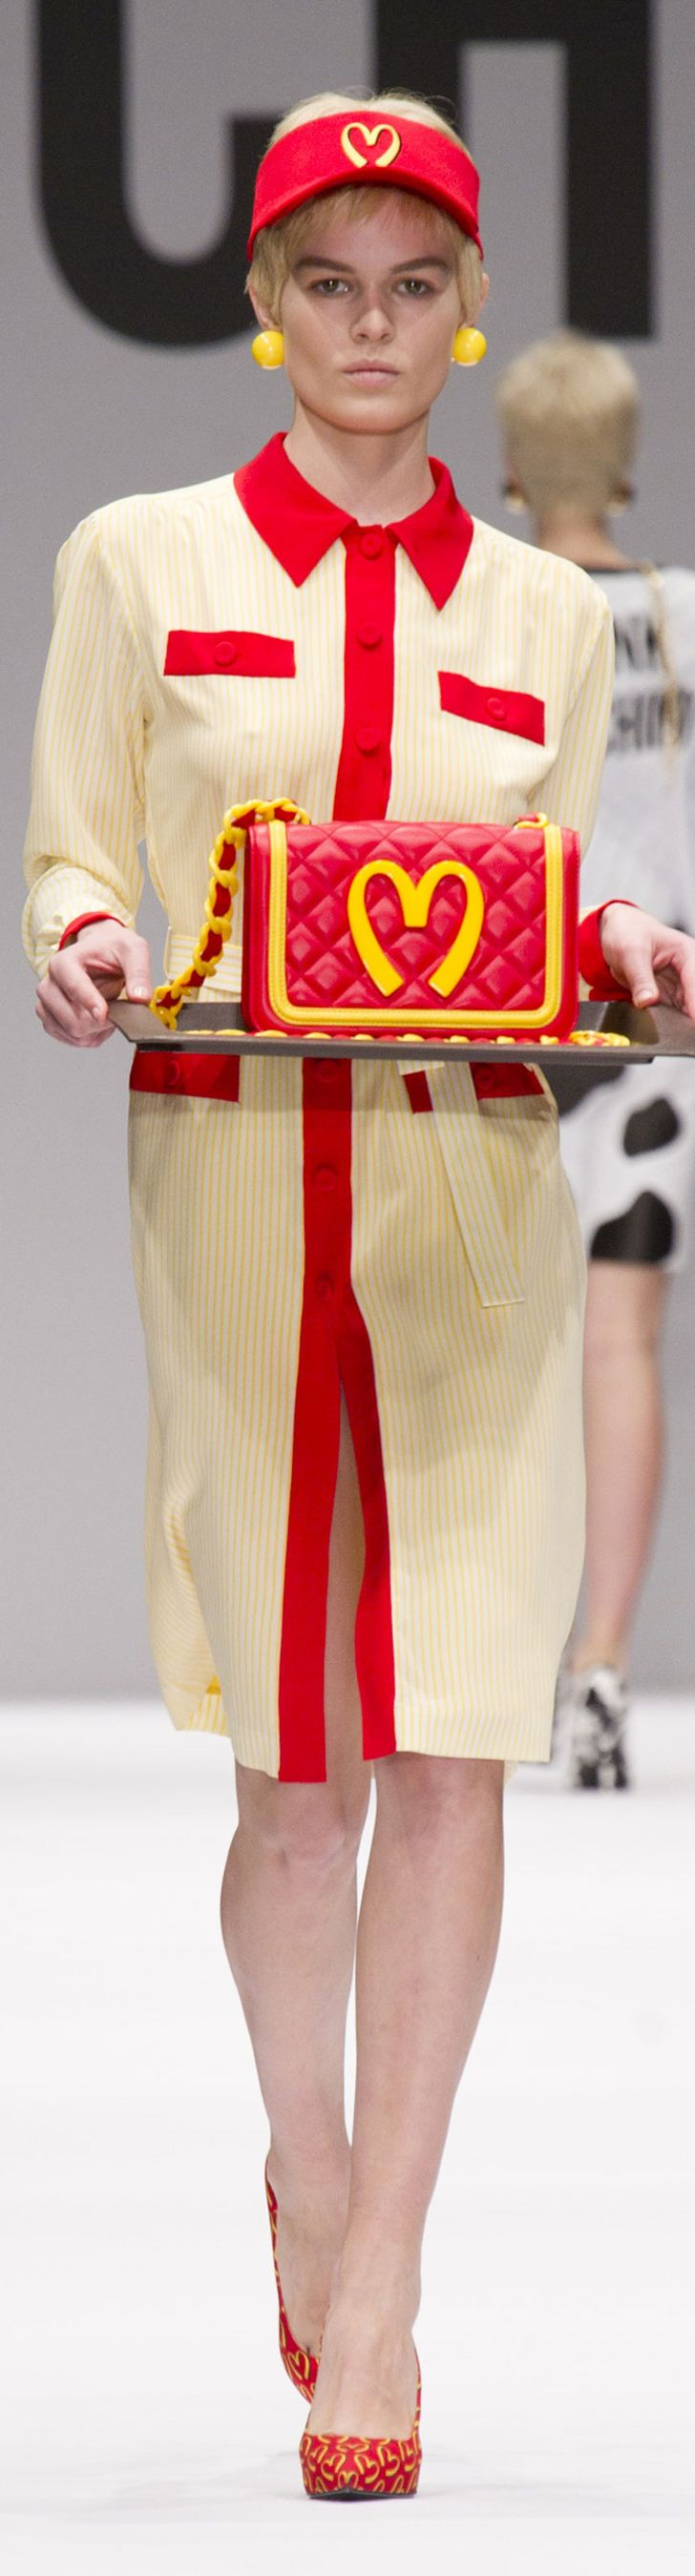 Jeremy Scott's McDonalds-inspired collection